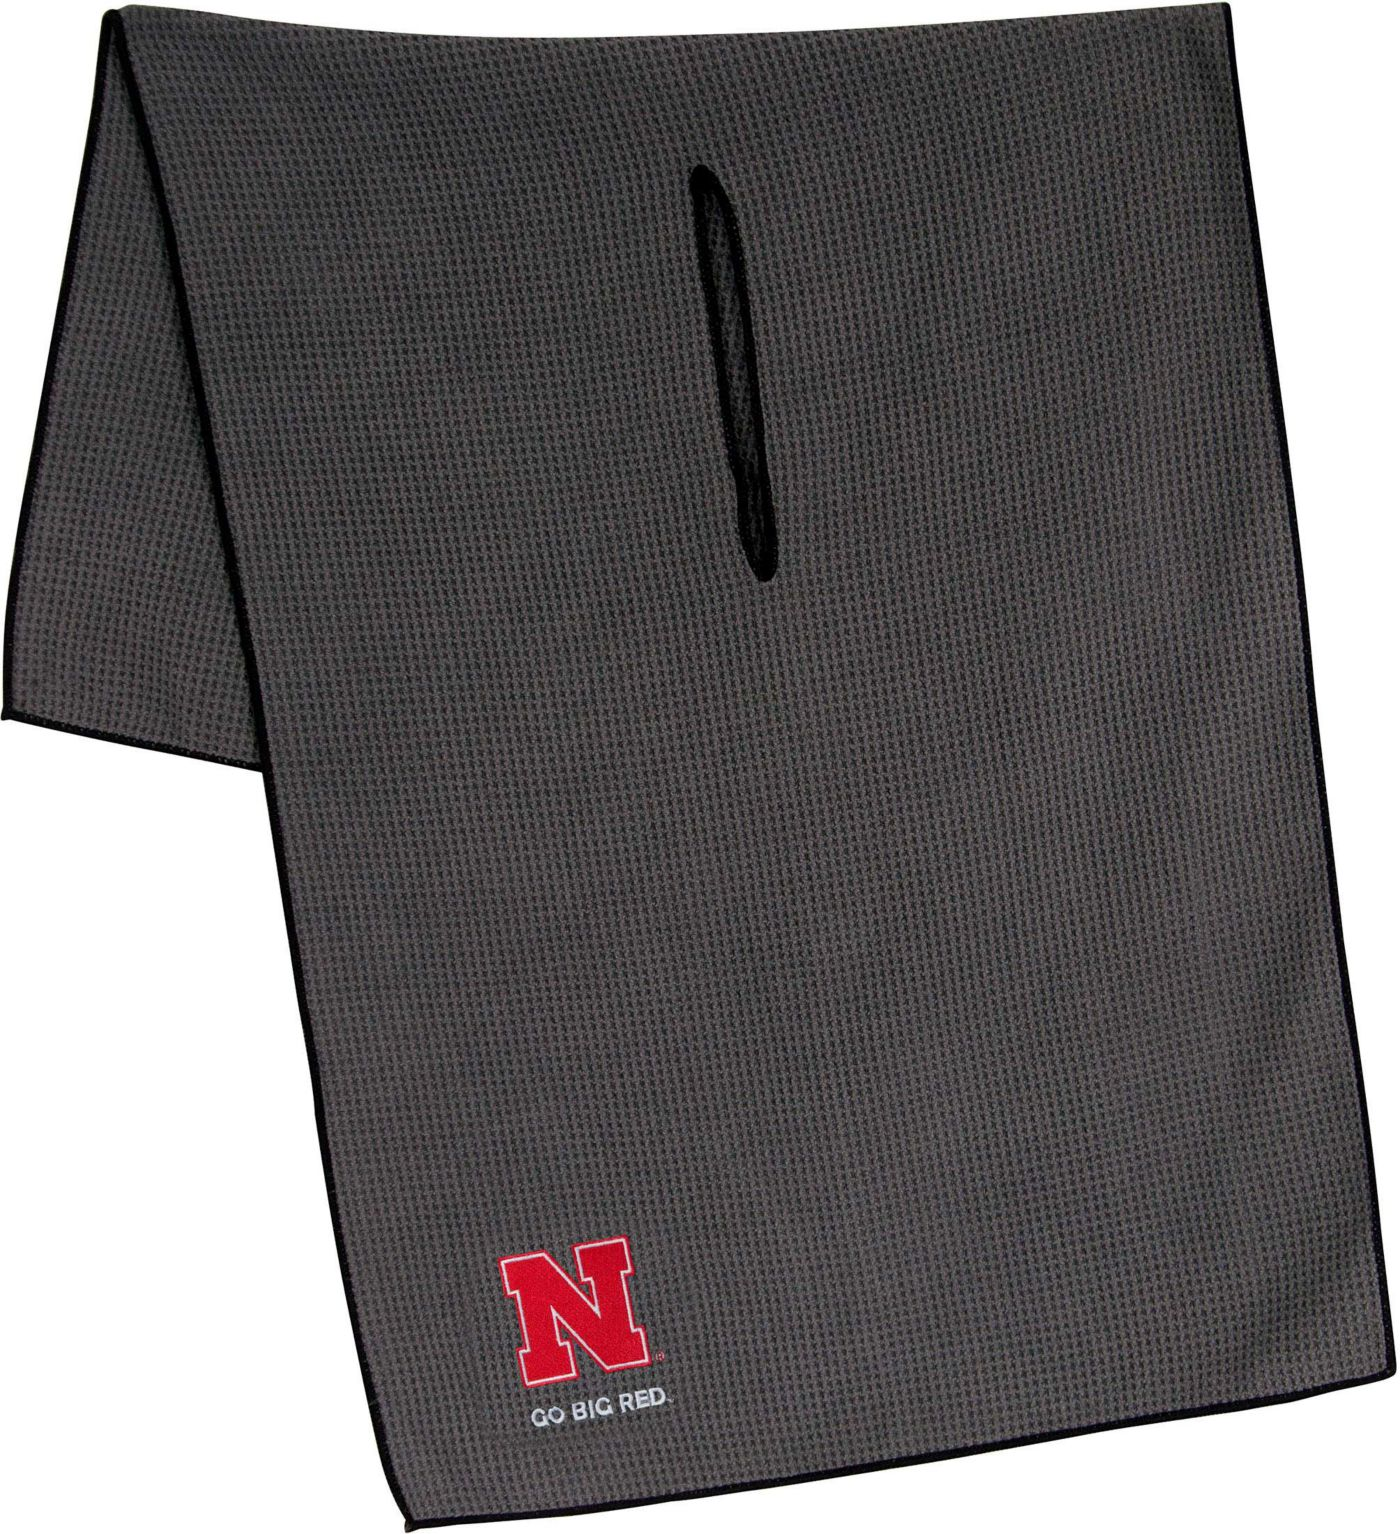 "Team Effort Nebraska Cornhuskers 19"" x 41"" Microfiber Golf Towel"